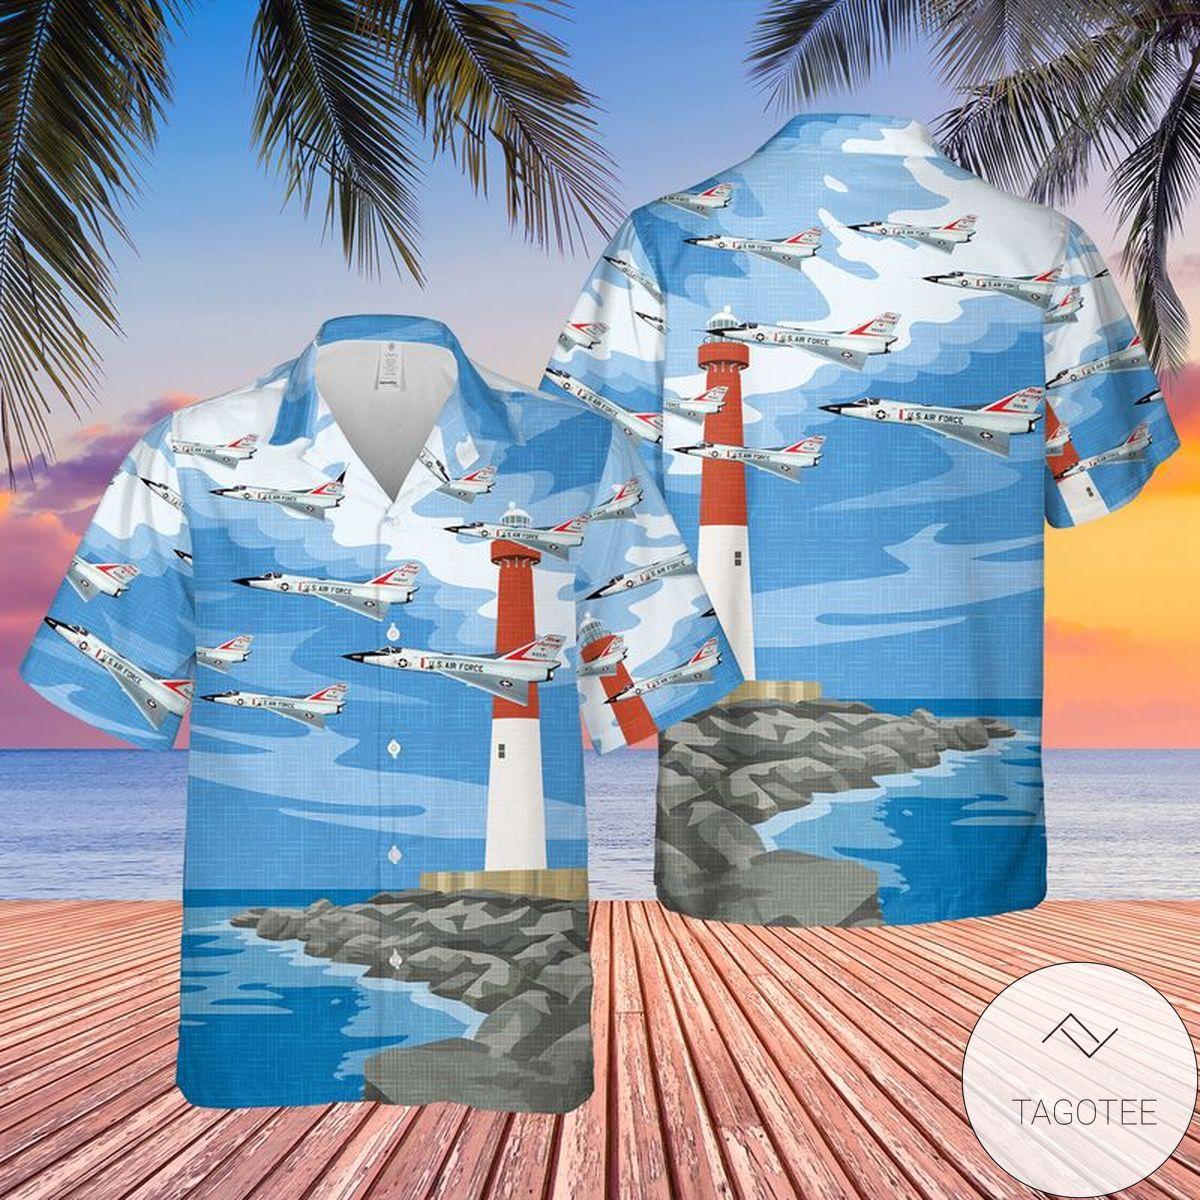 US Air Force Convair F-106 Delta Dart New Jersey Hawaiian Shirt, Beach Shorts